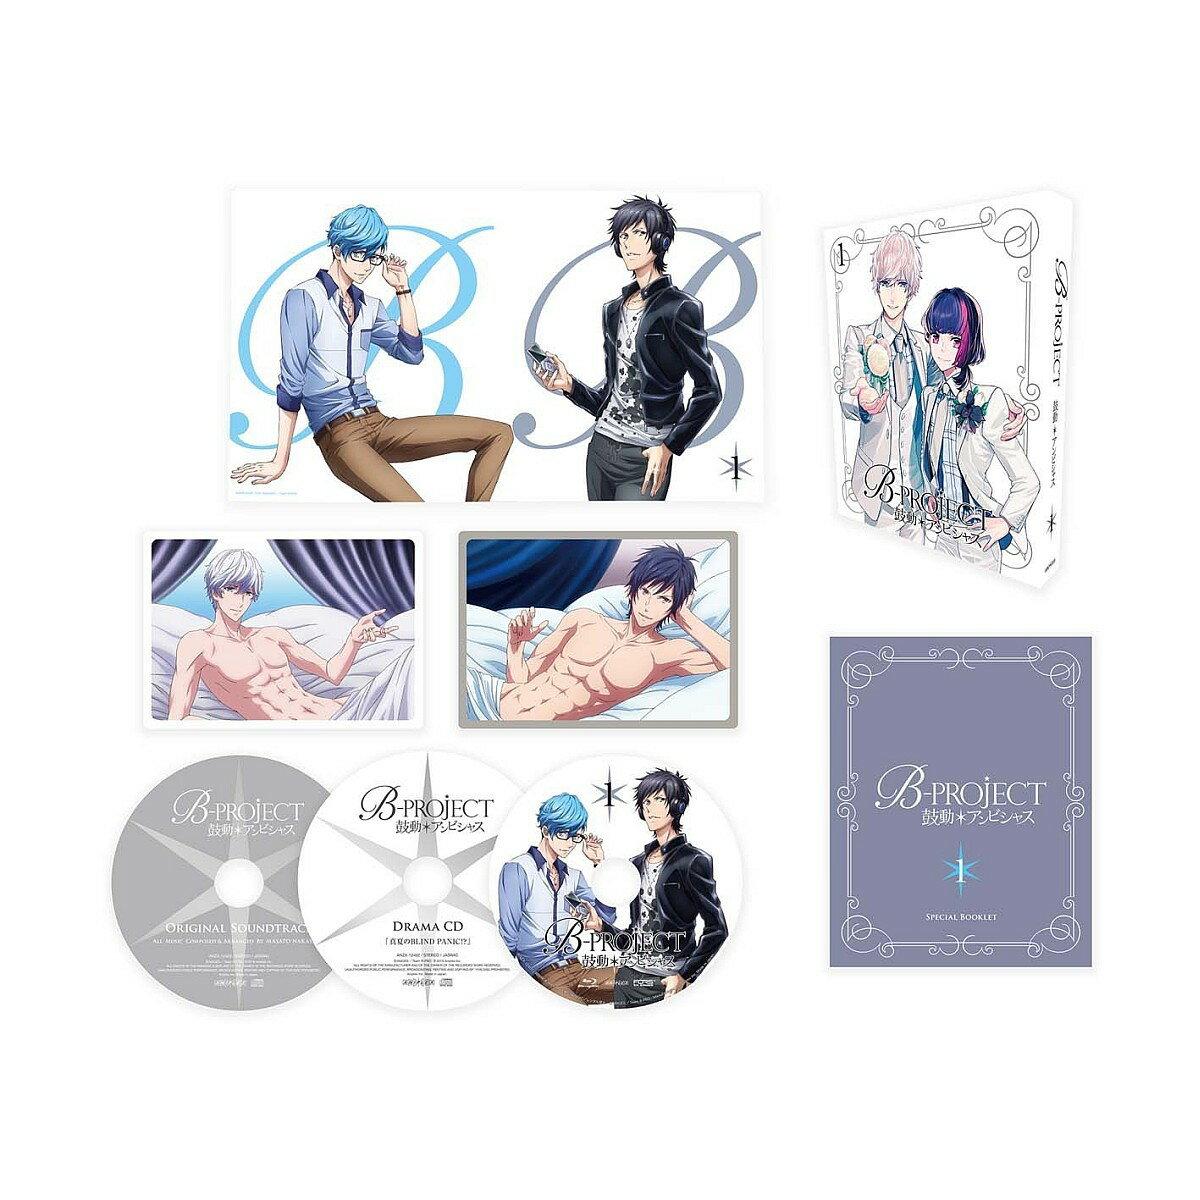 B-PROJECT 鼓動*アンビシャス 1【Blu-ray】画像